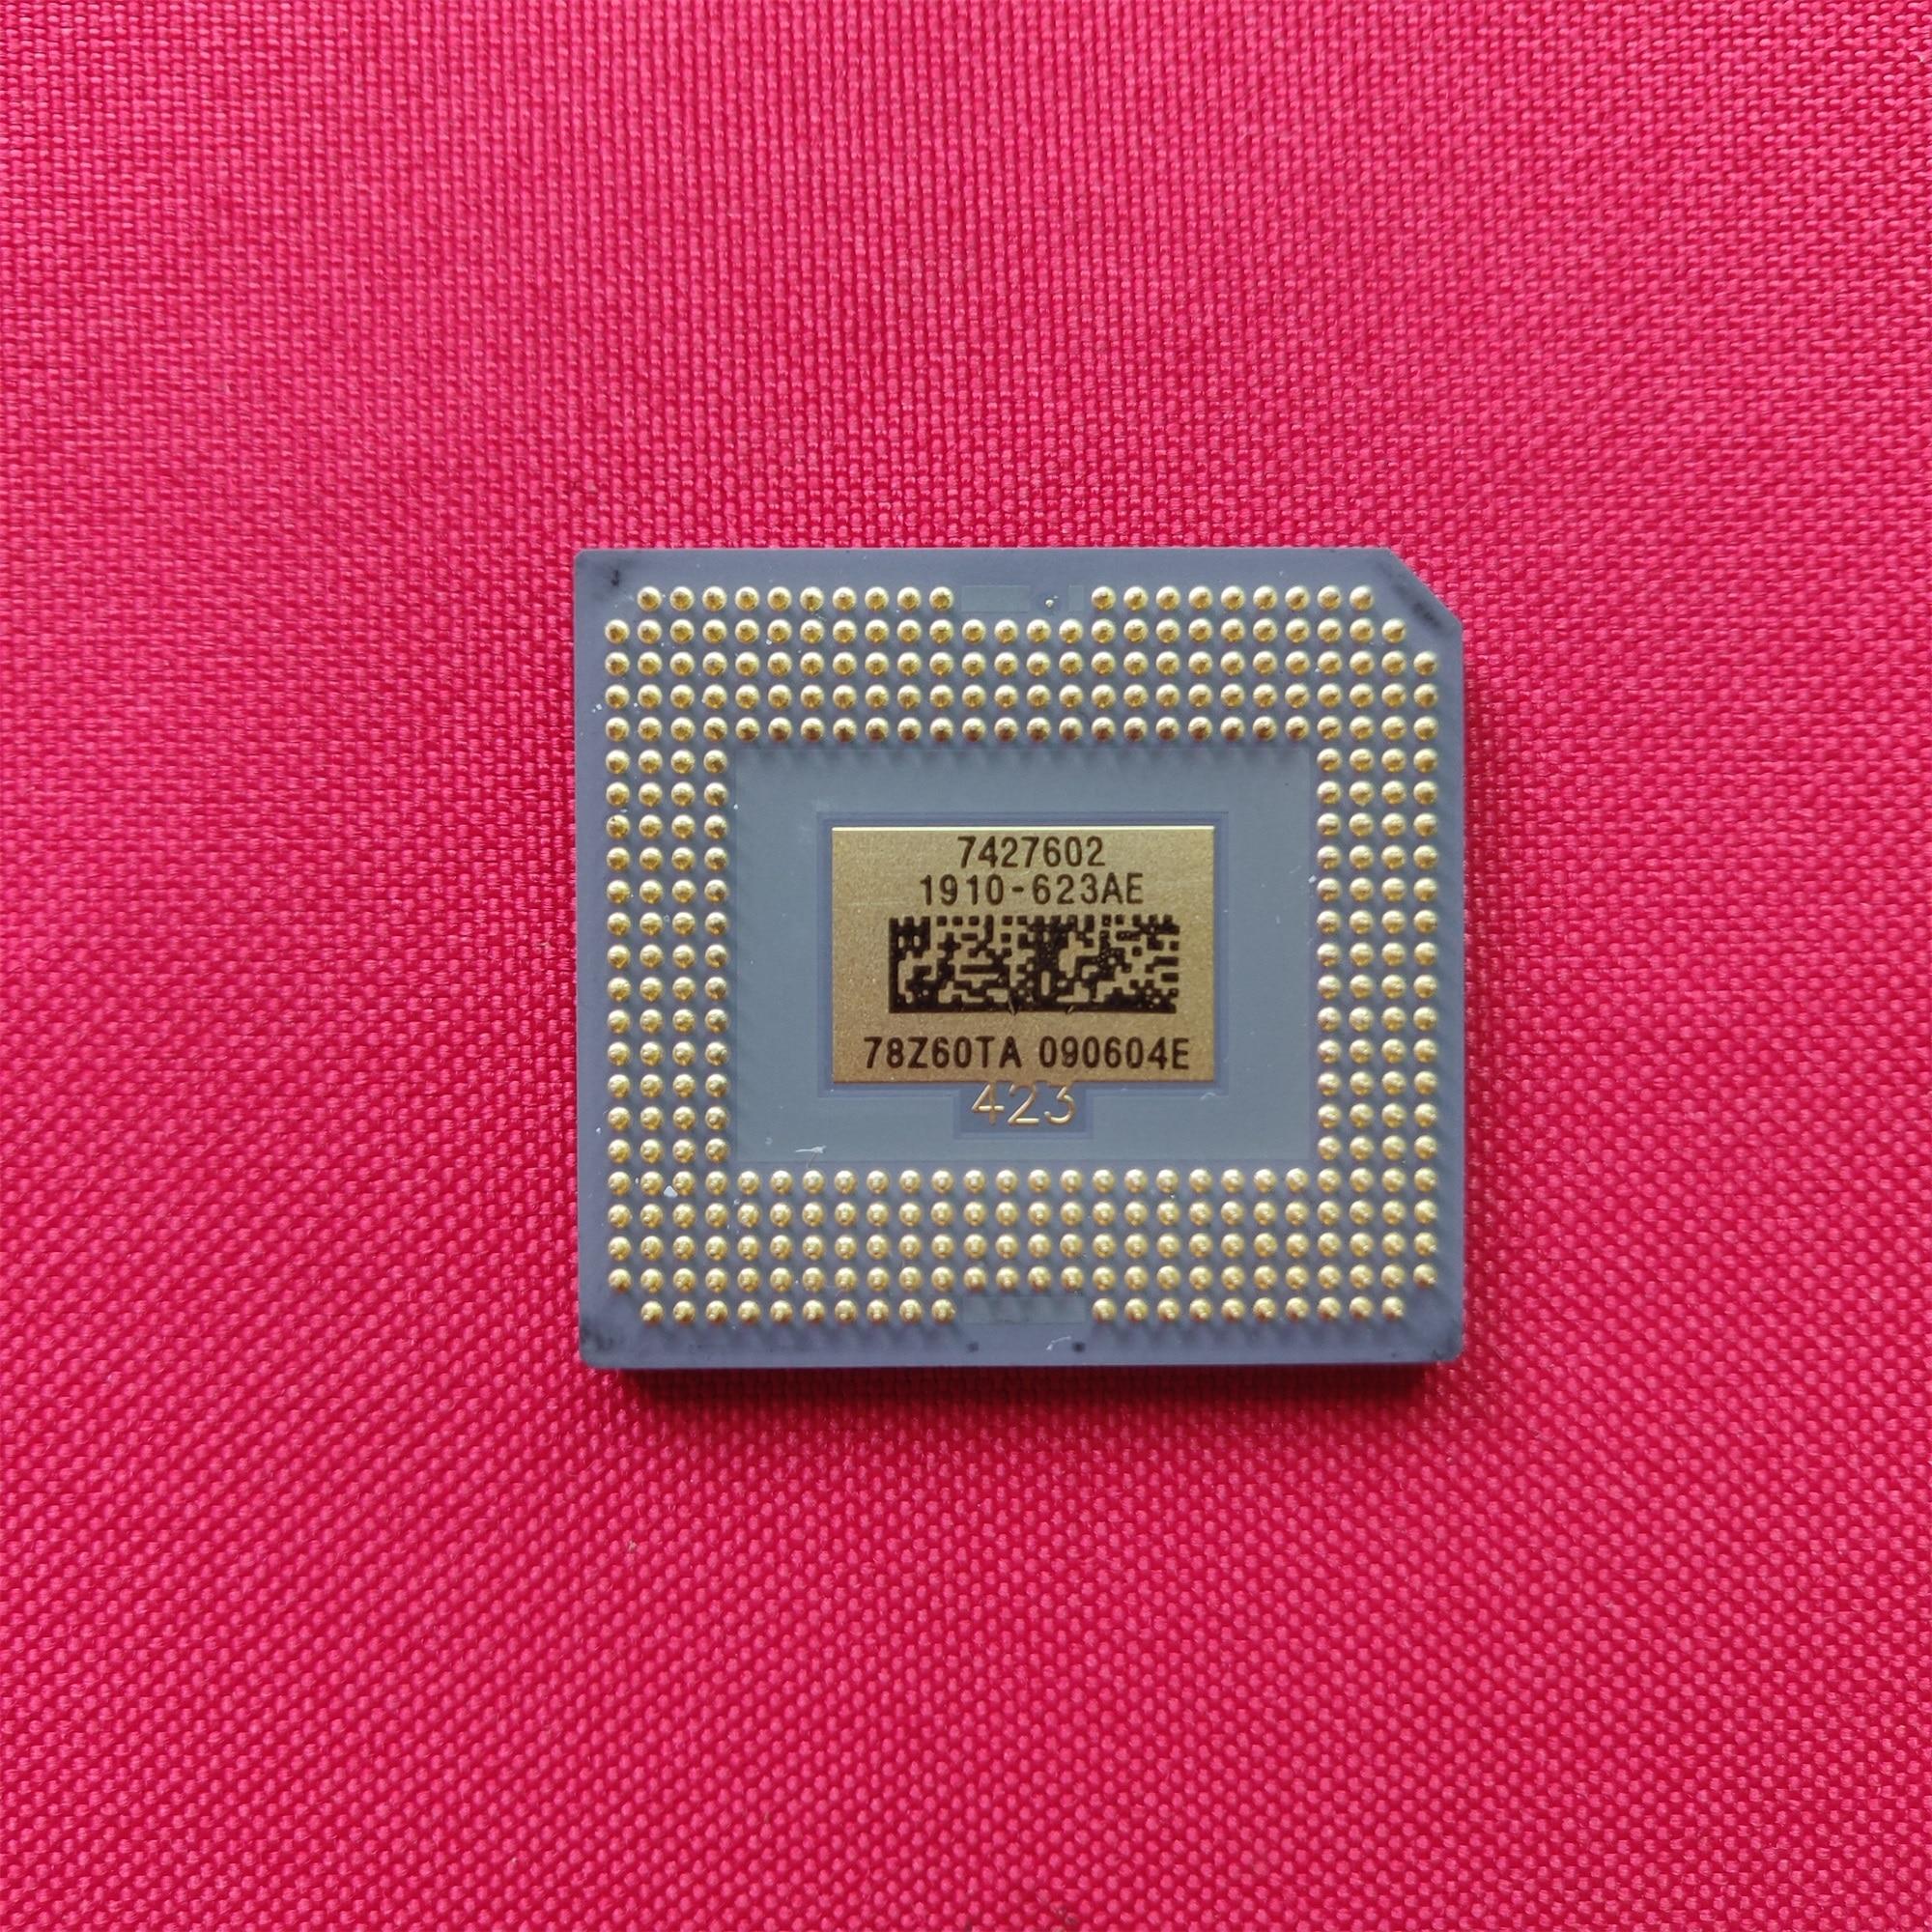 Originele Nieuwe 1910-3032E 1910-6039E 1910-6037E 1910-6239E Dlp Chip Dmd Chip Voor Benq W1070 Projector In Voorraad